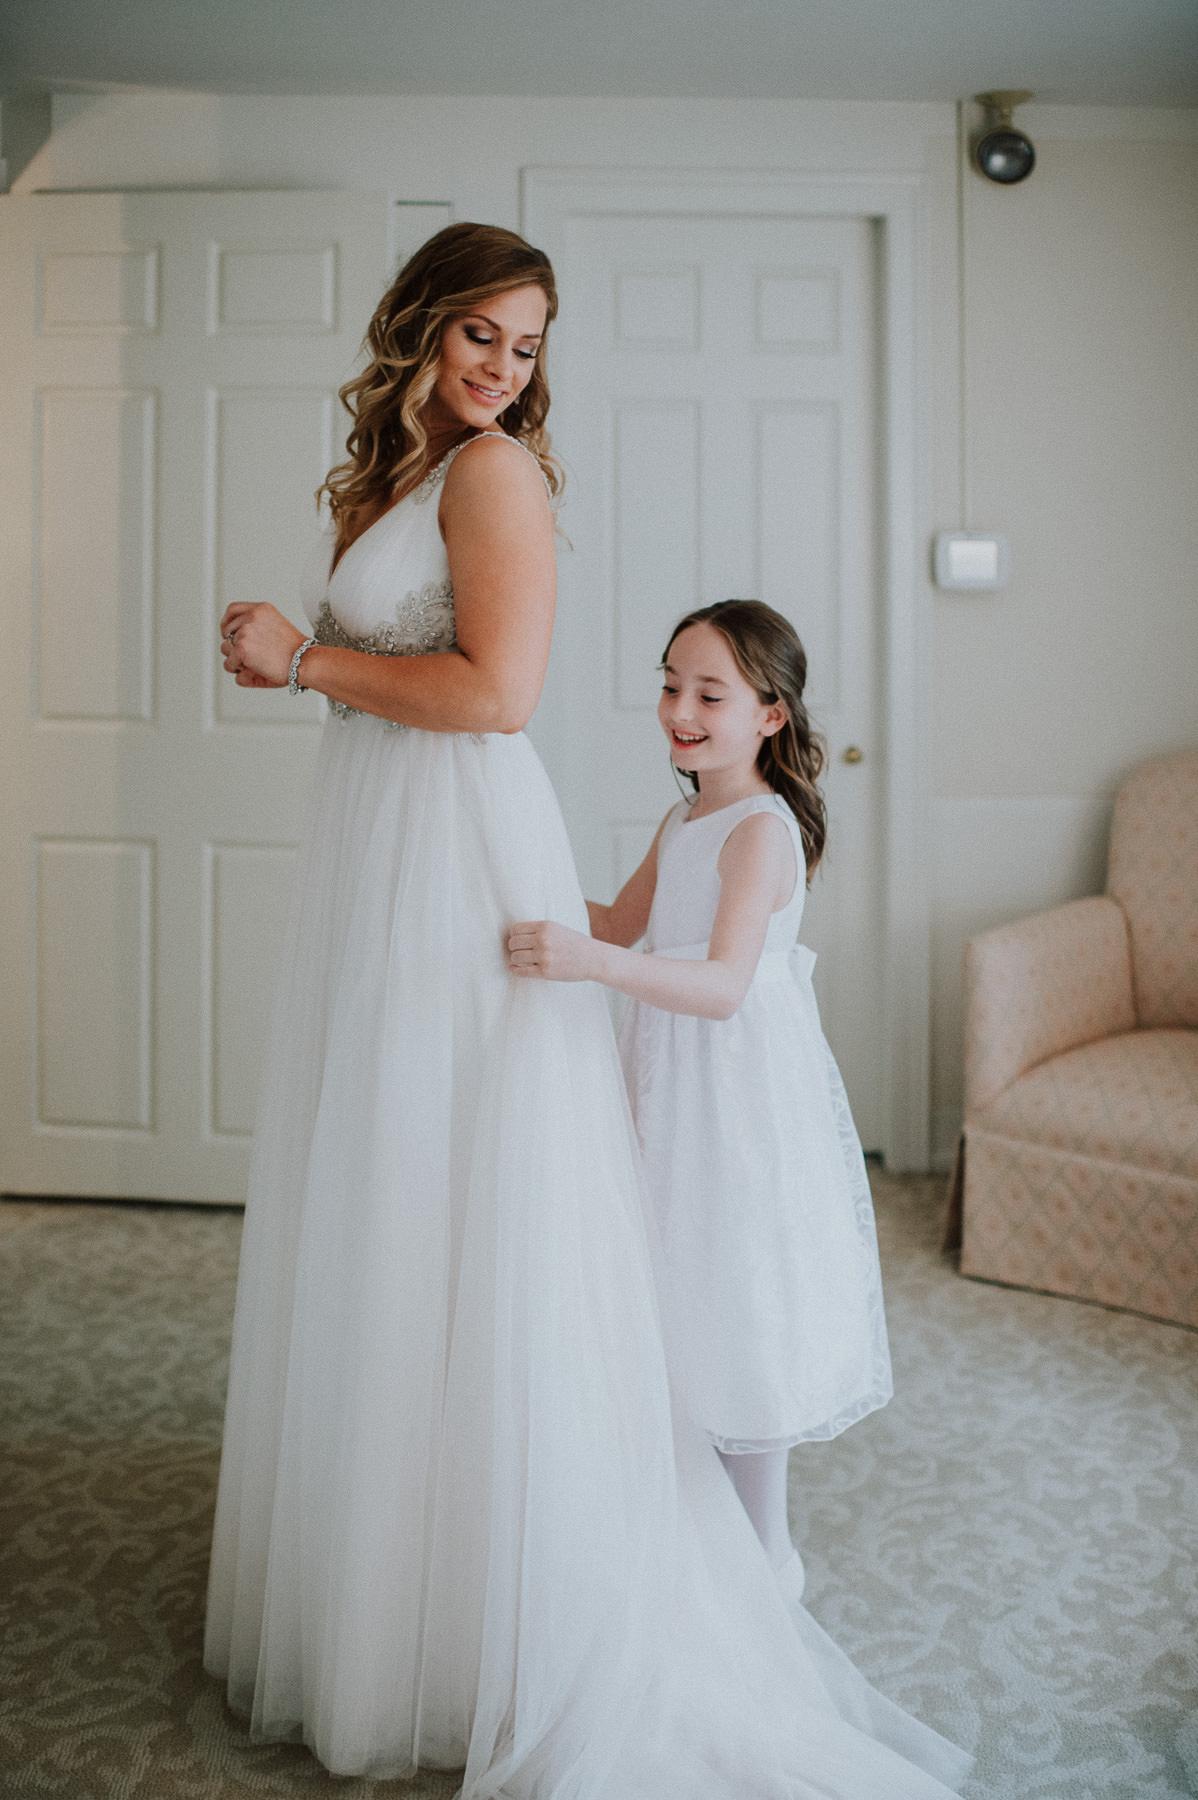 appleford-estate-wedding-photography-22.jpg